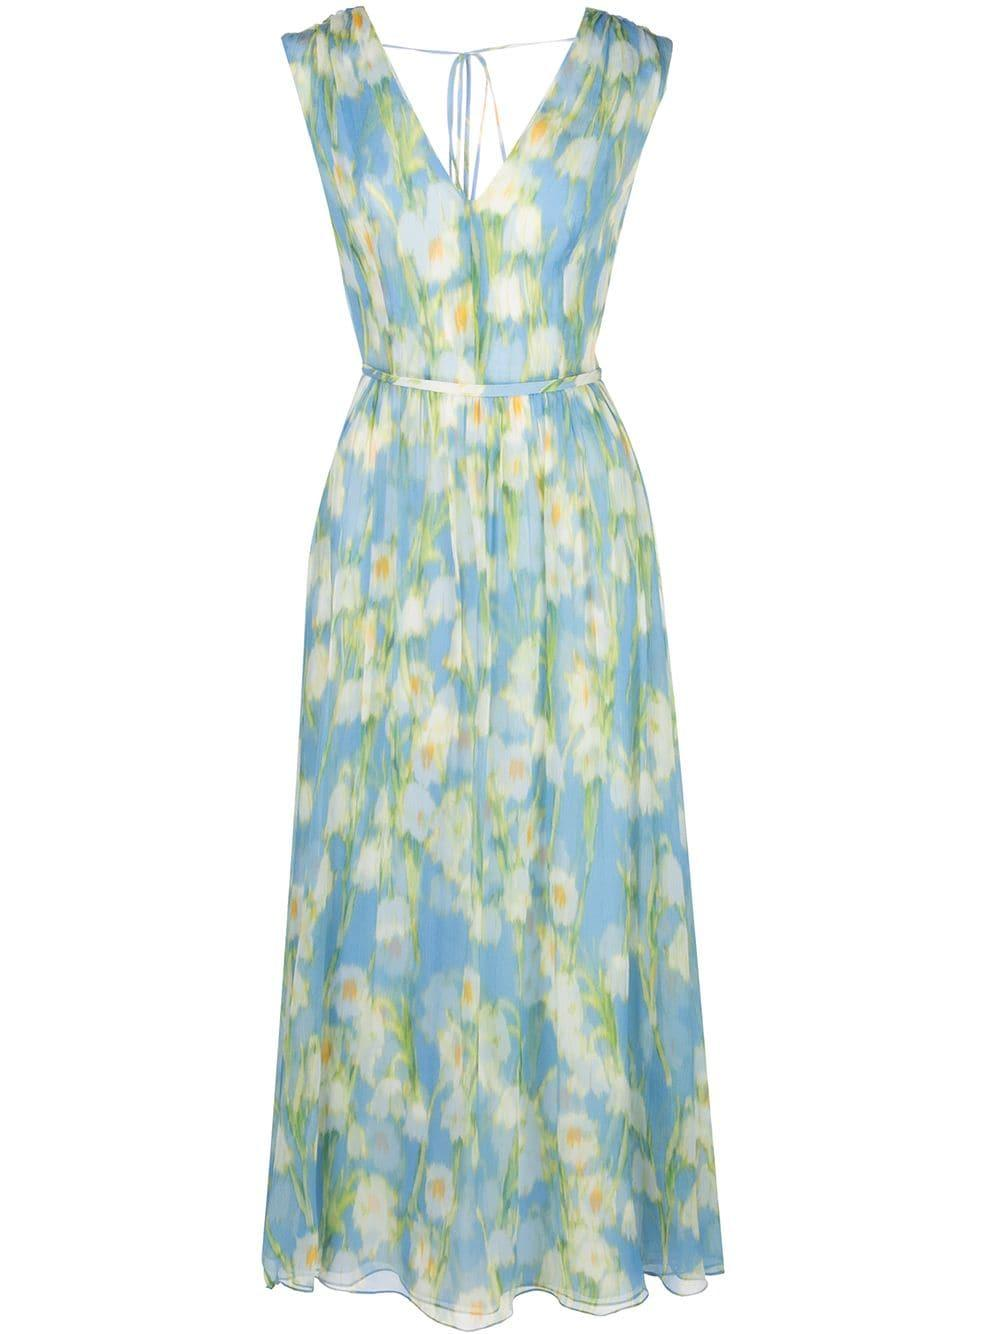 Sleeveless V- Neck Lilly Of The Valley Midi Dress Item # S2011N561LVC